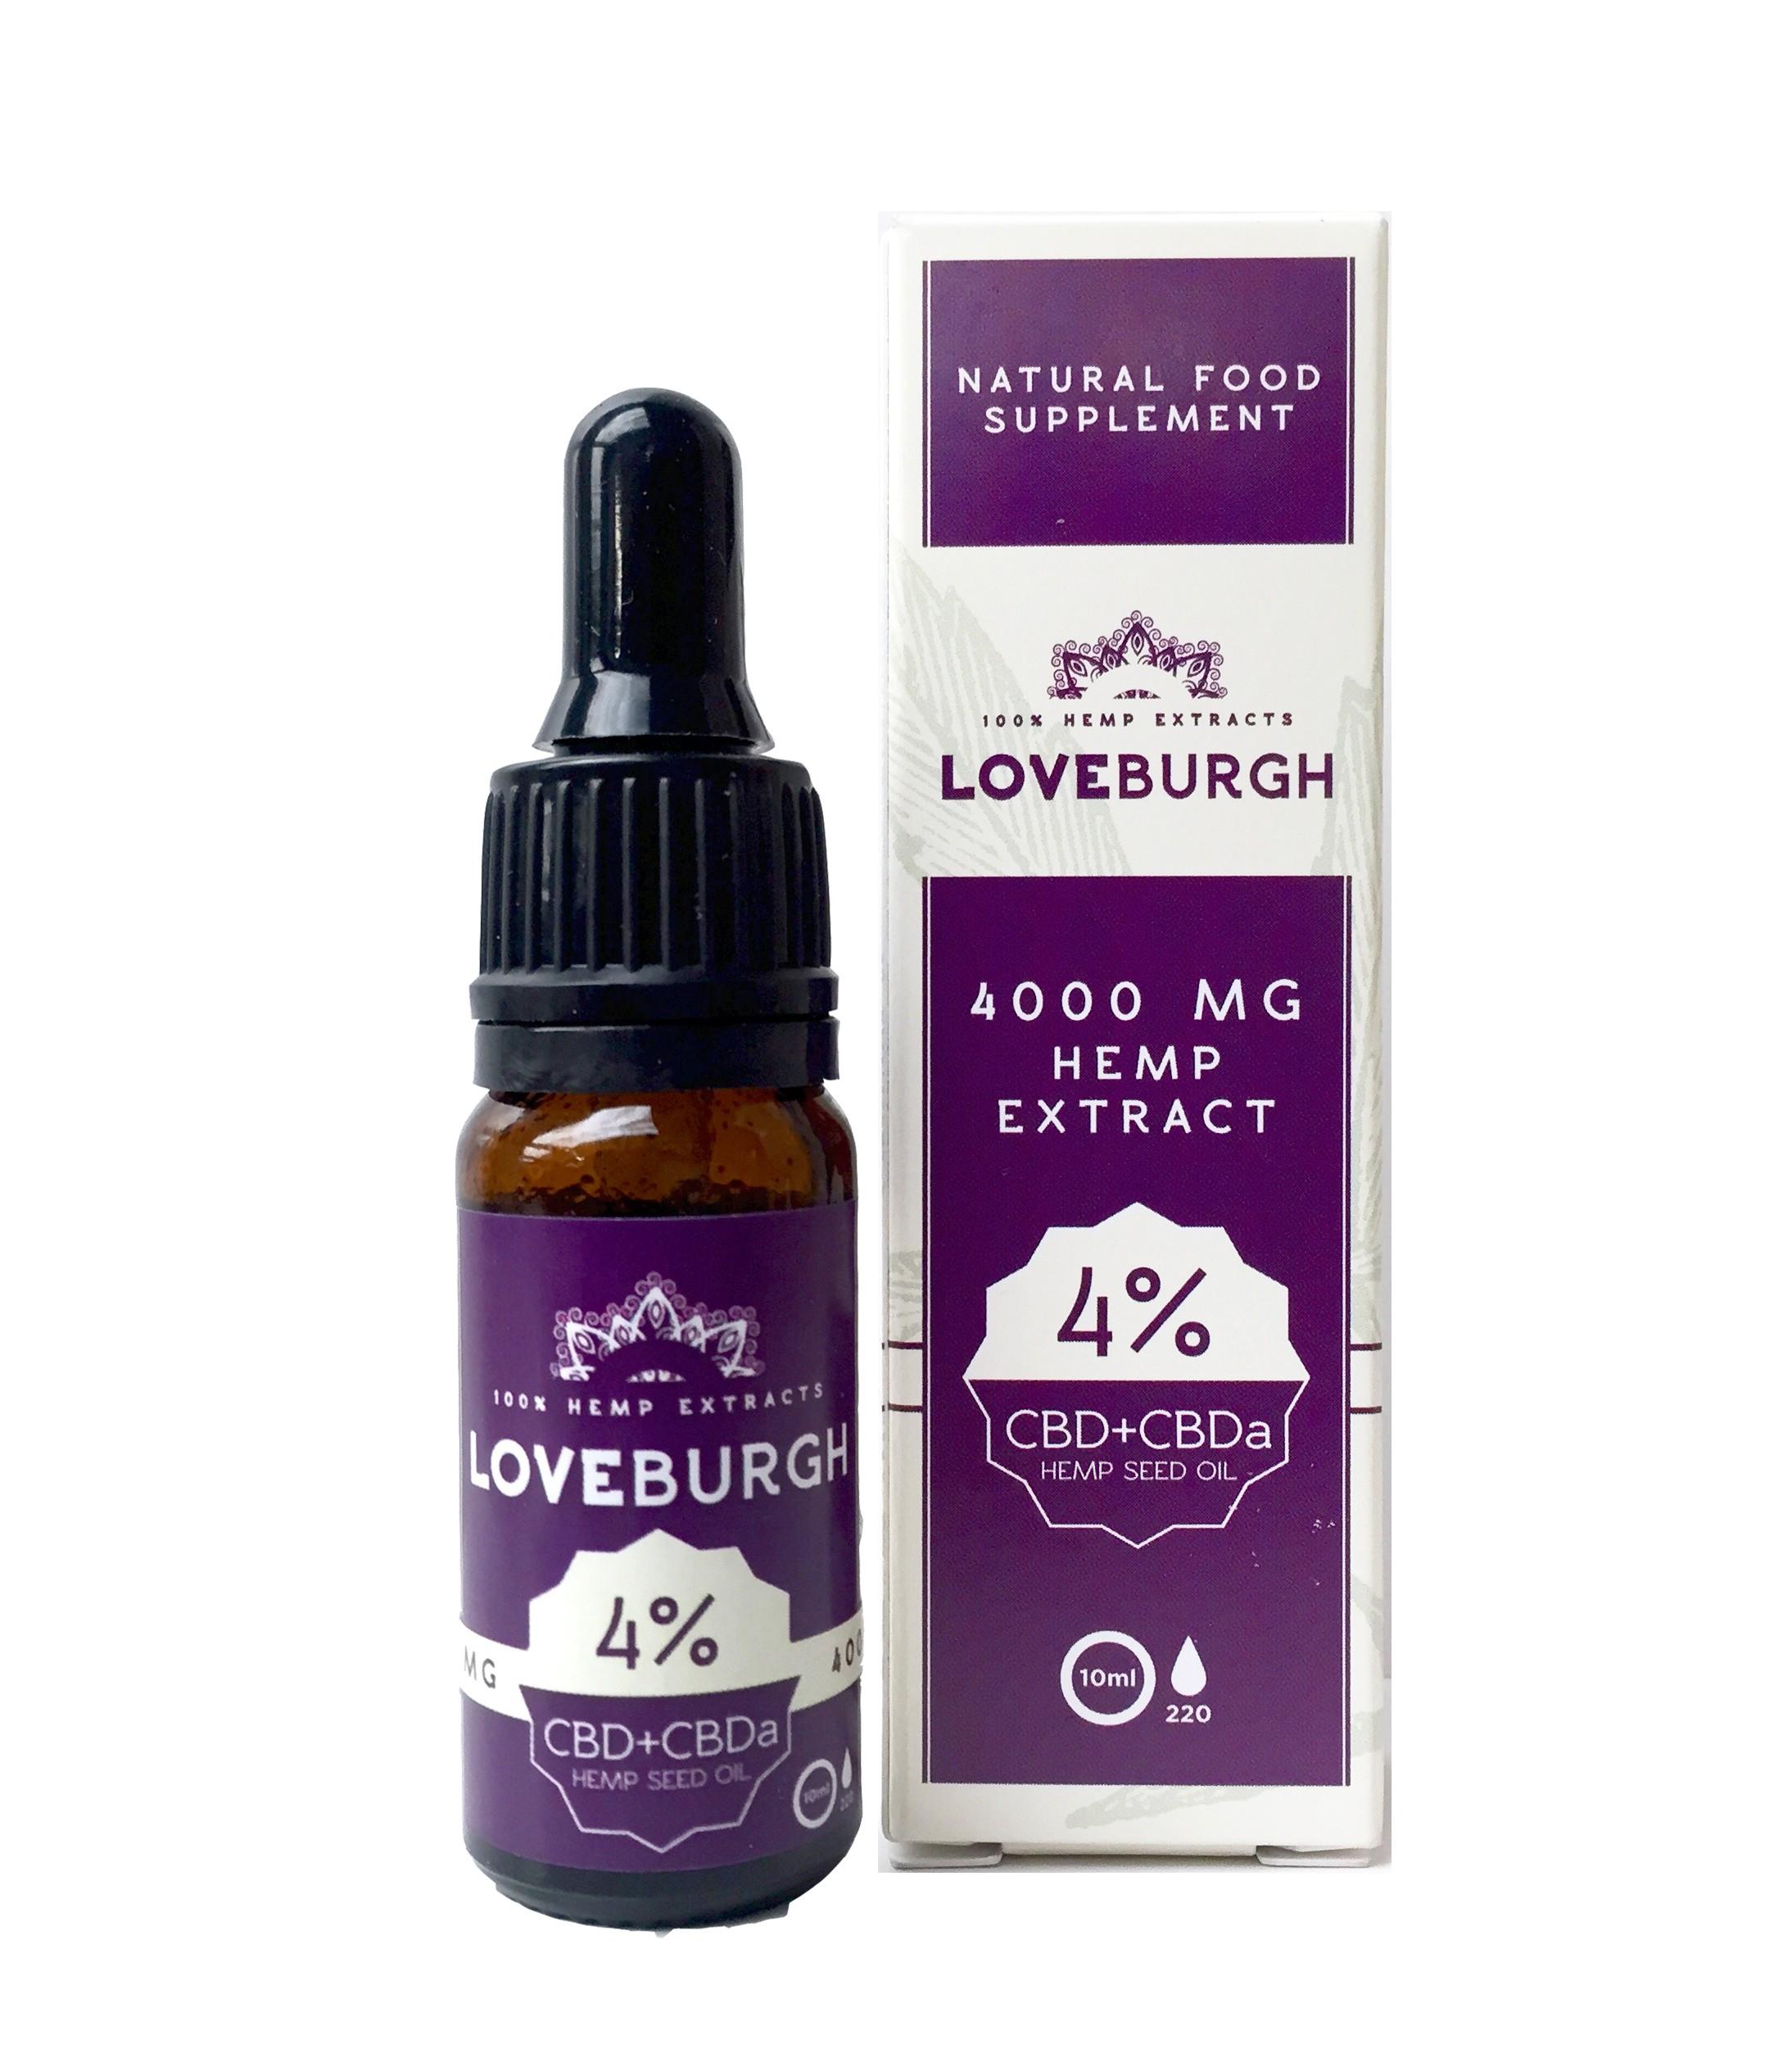 LOVEBURGH CBD SUPPLEMENT - 4% CBD + CBDa